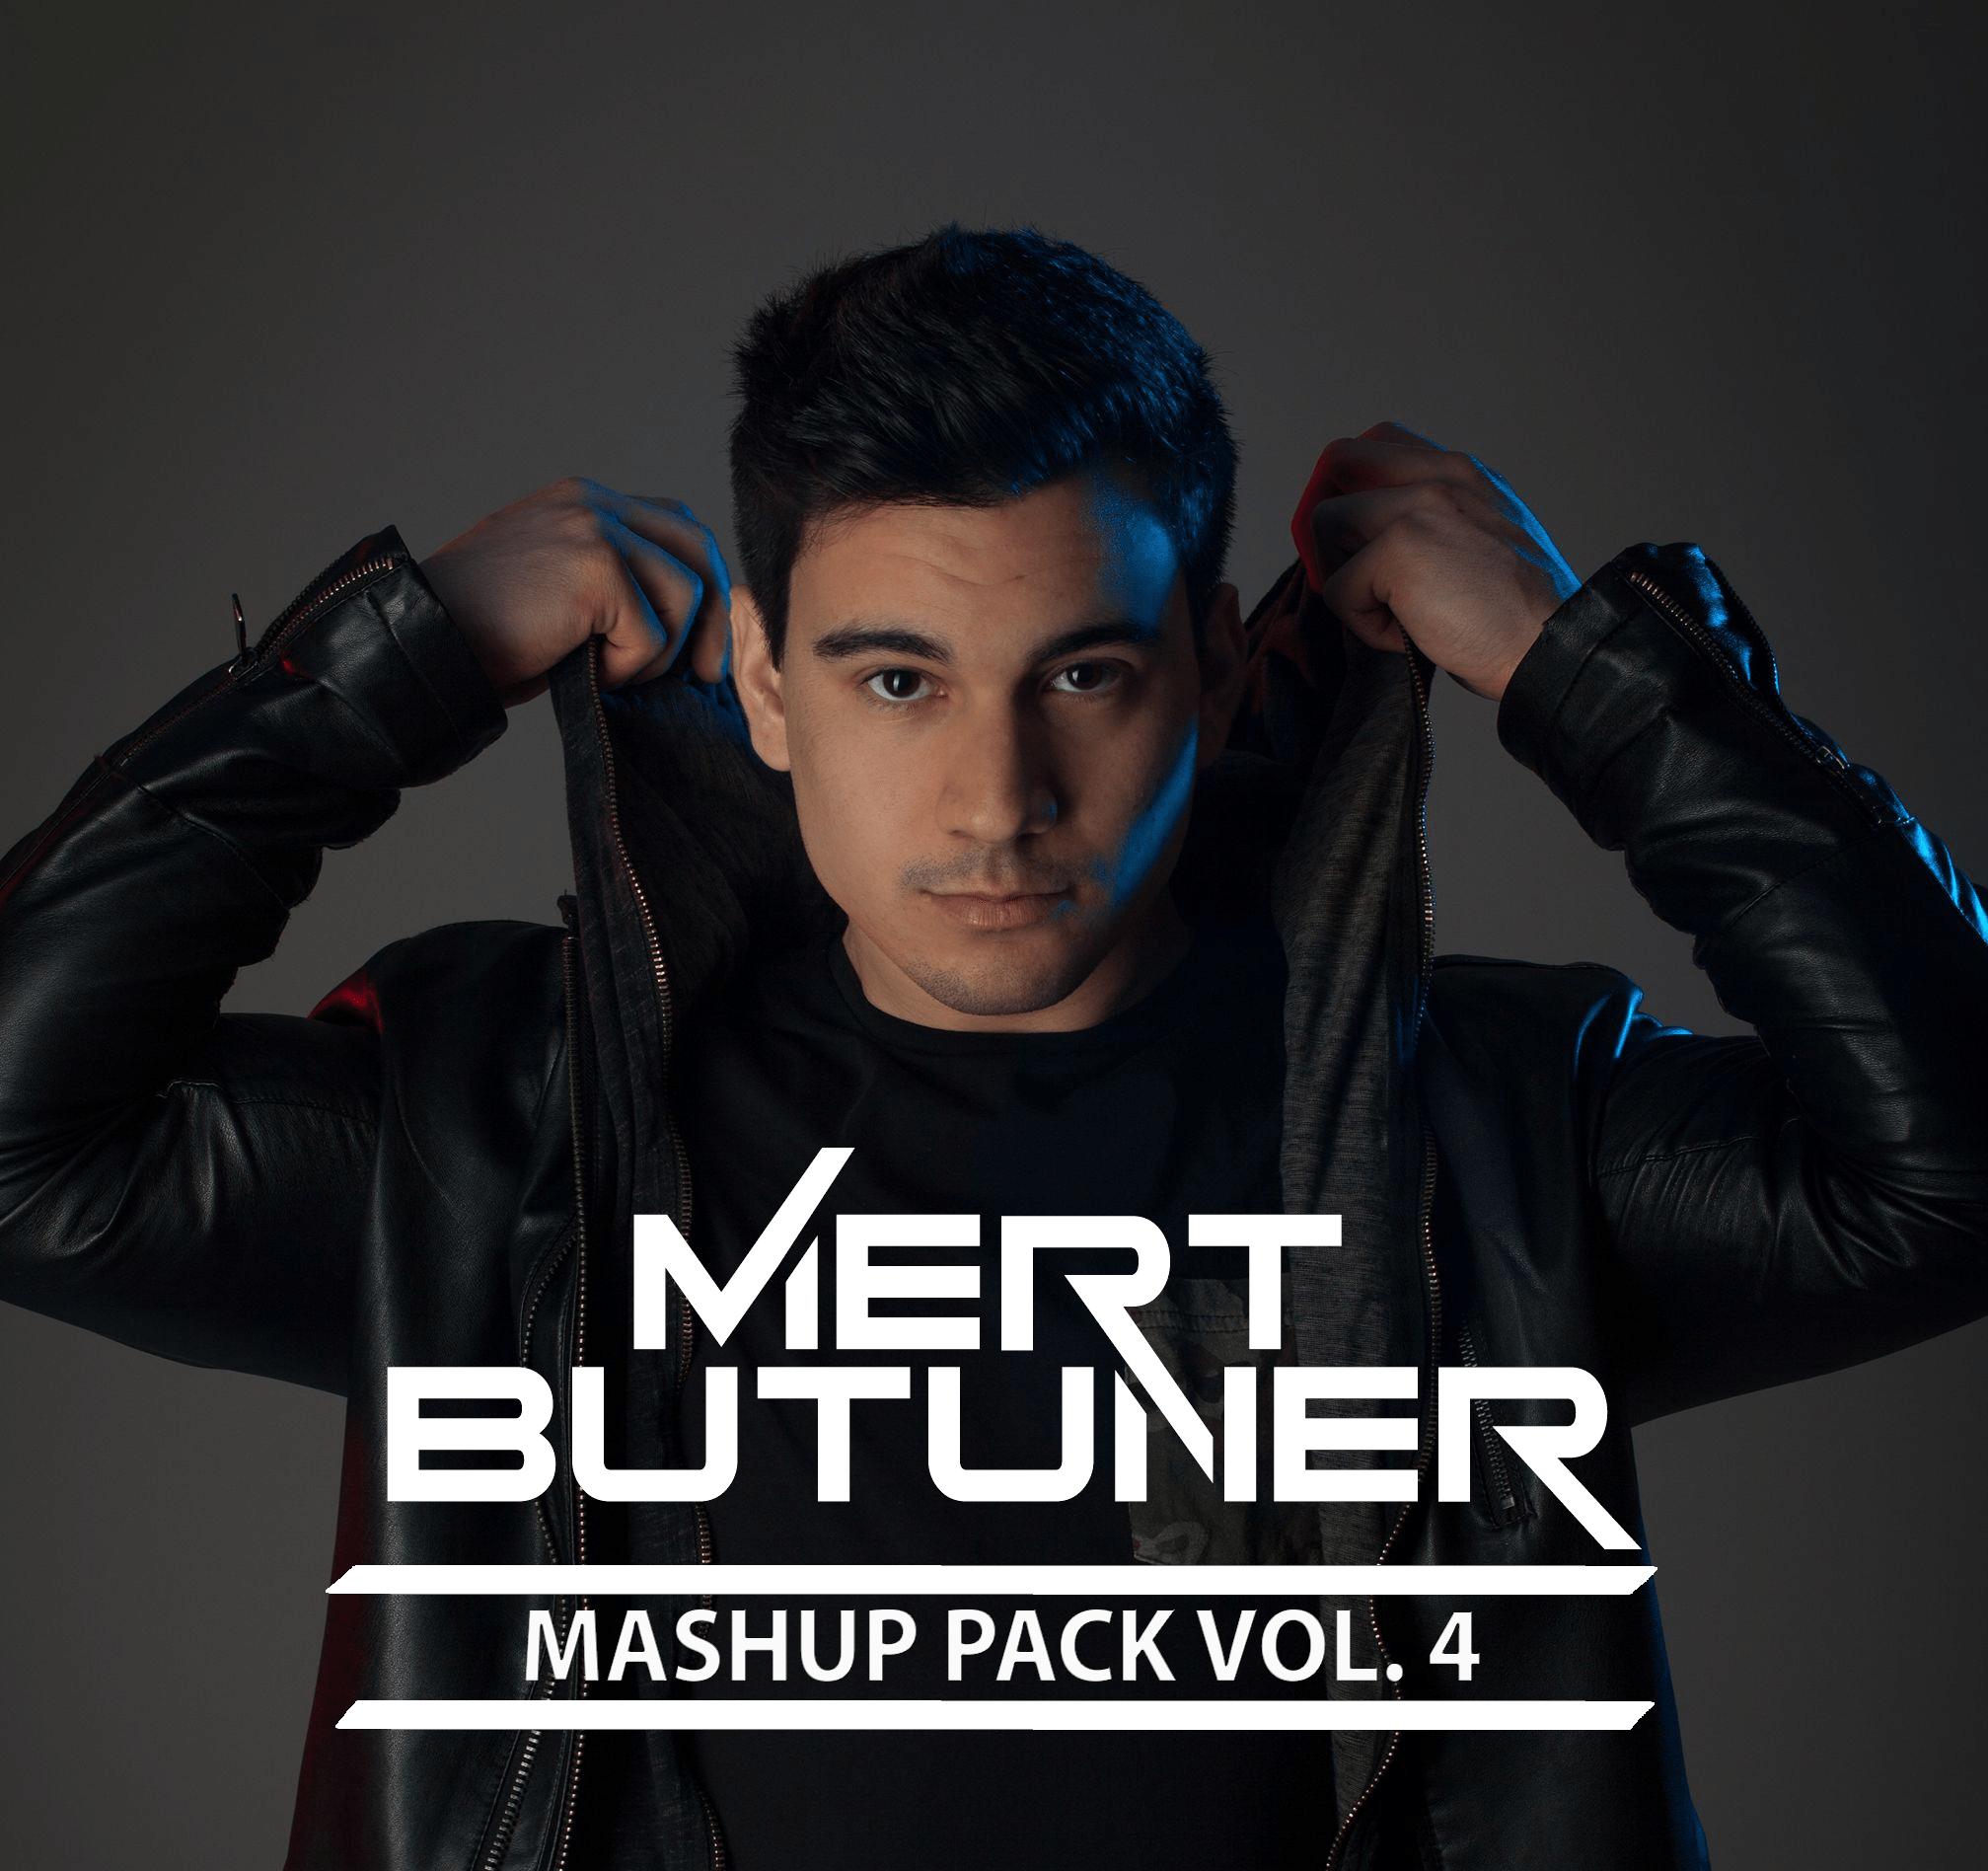 mashup_pack_vol.4.png